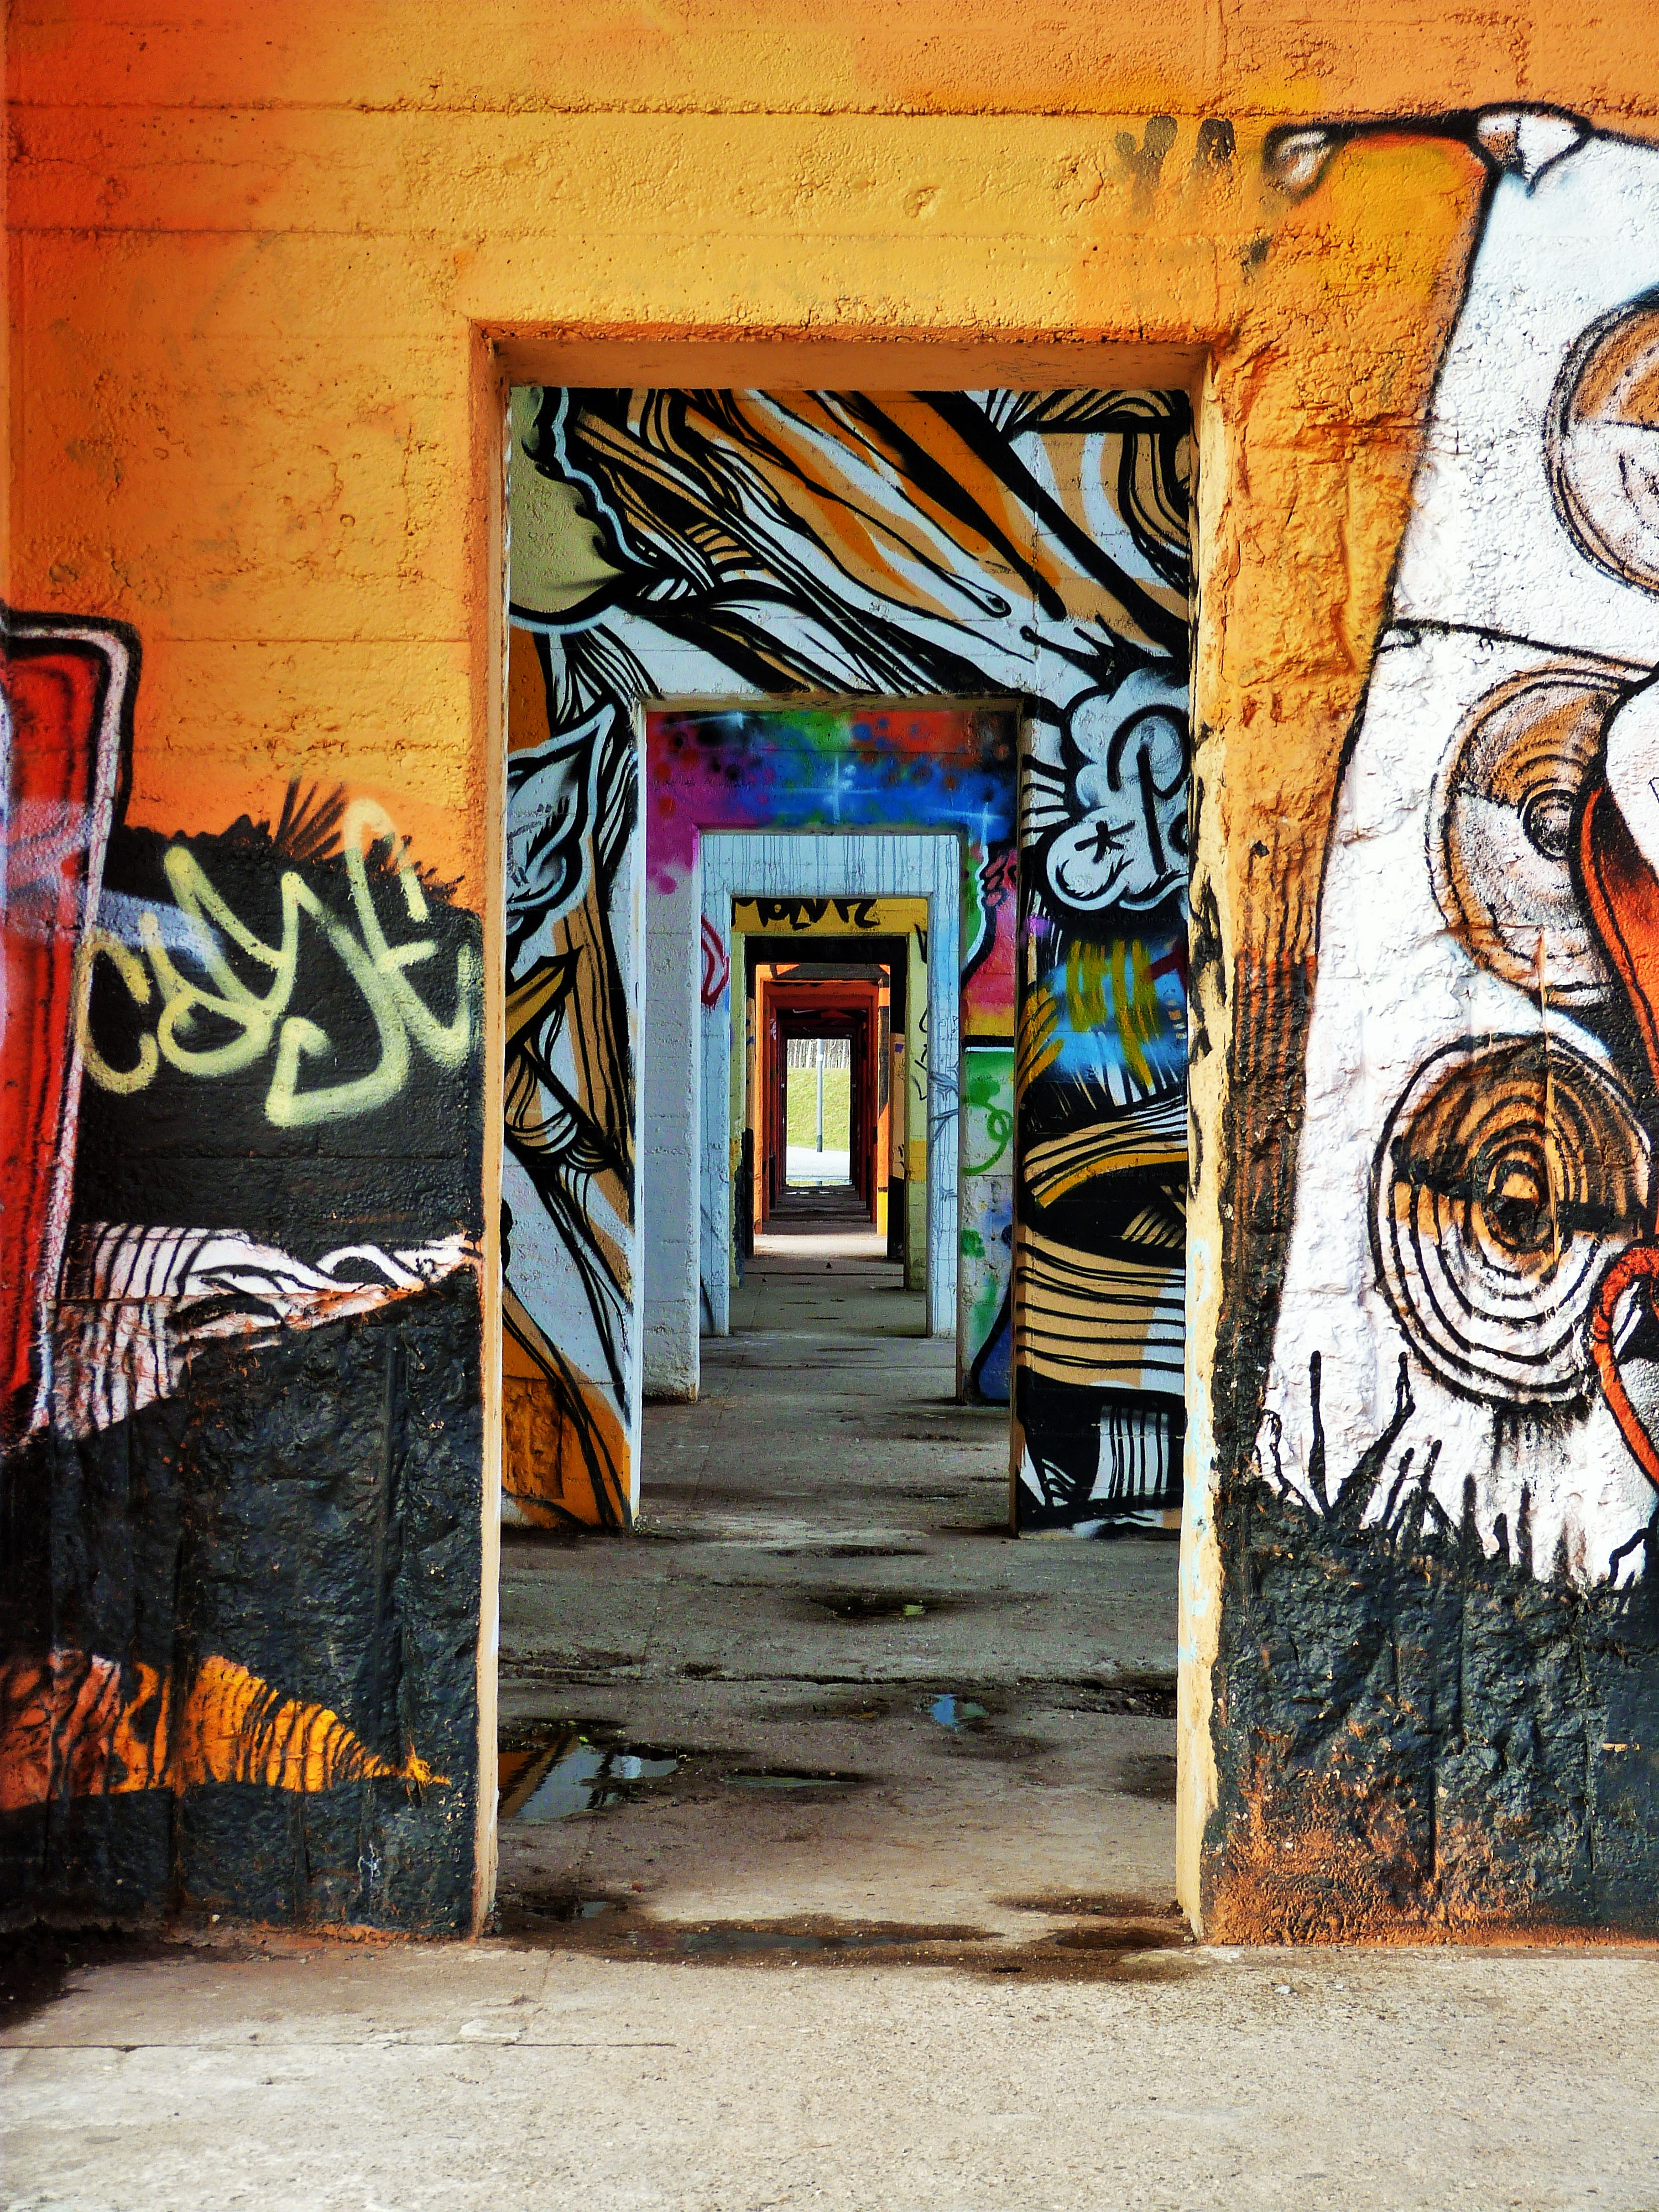 Graffiti Duisburg rheinpark graffiti duisburg 5 continental breakfast travel